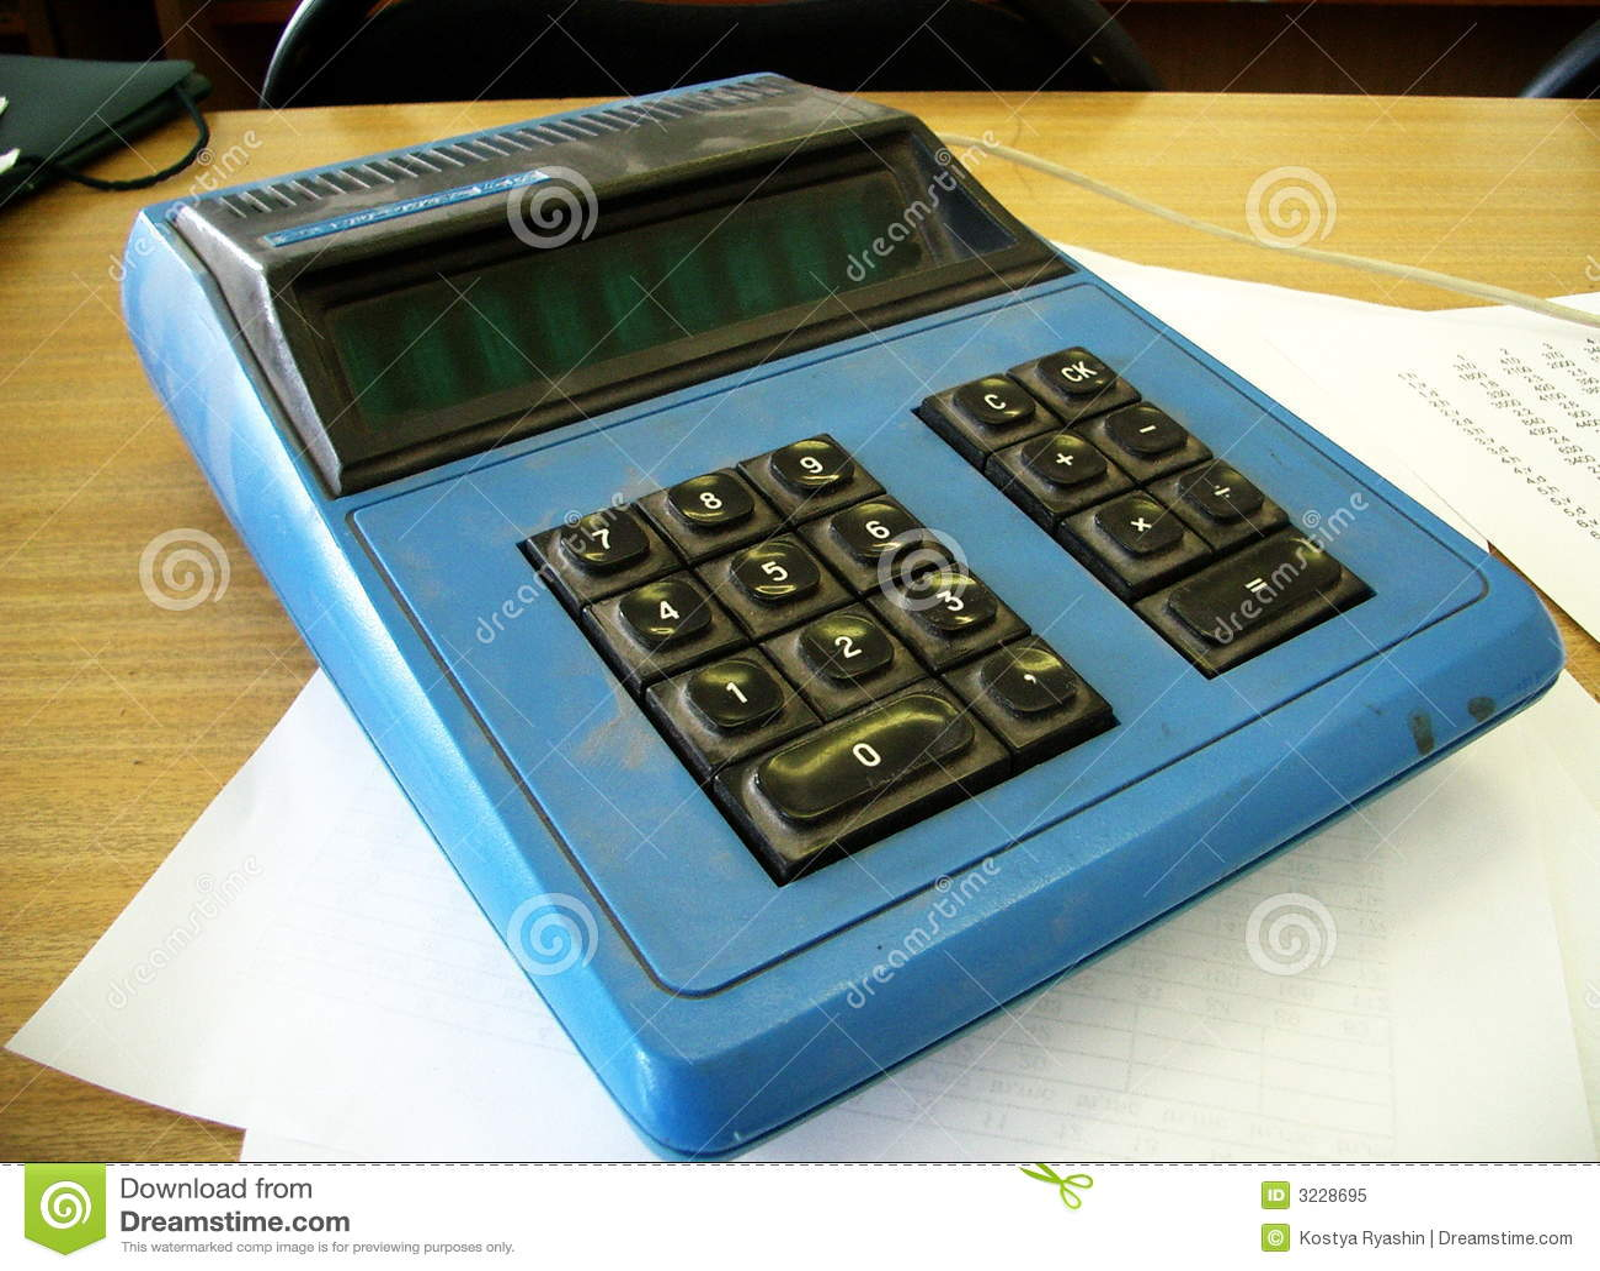 payment calculator download